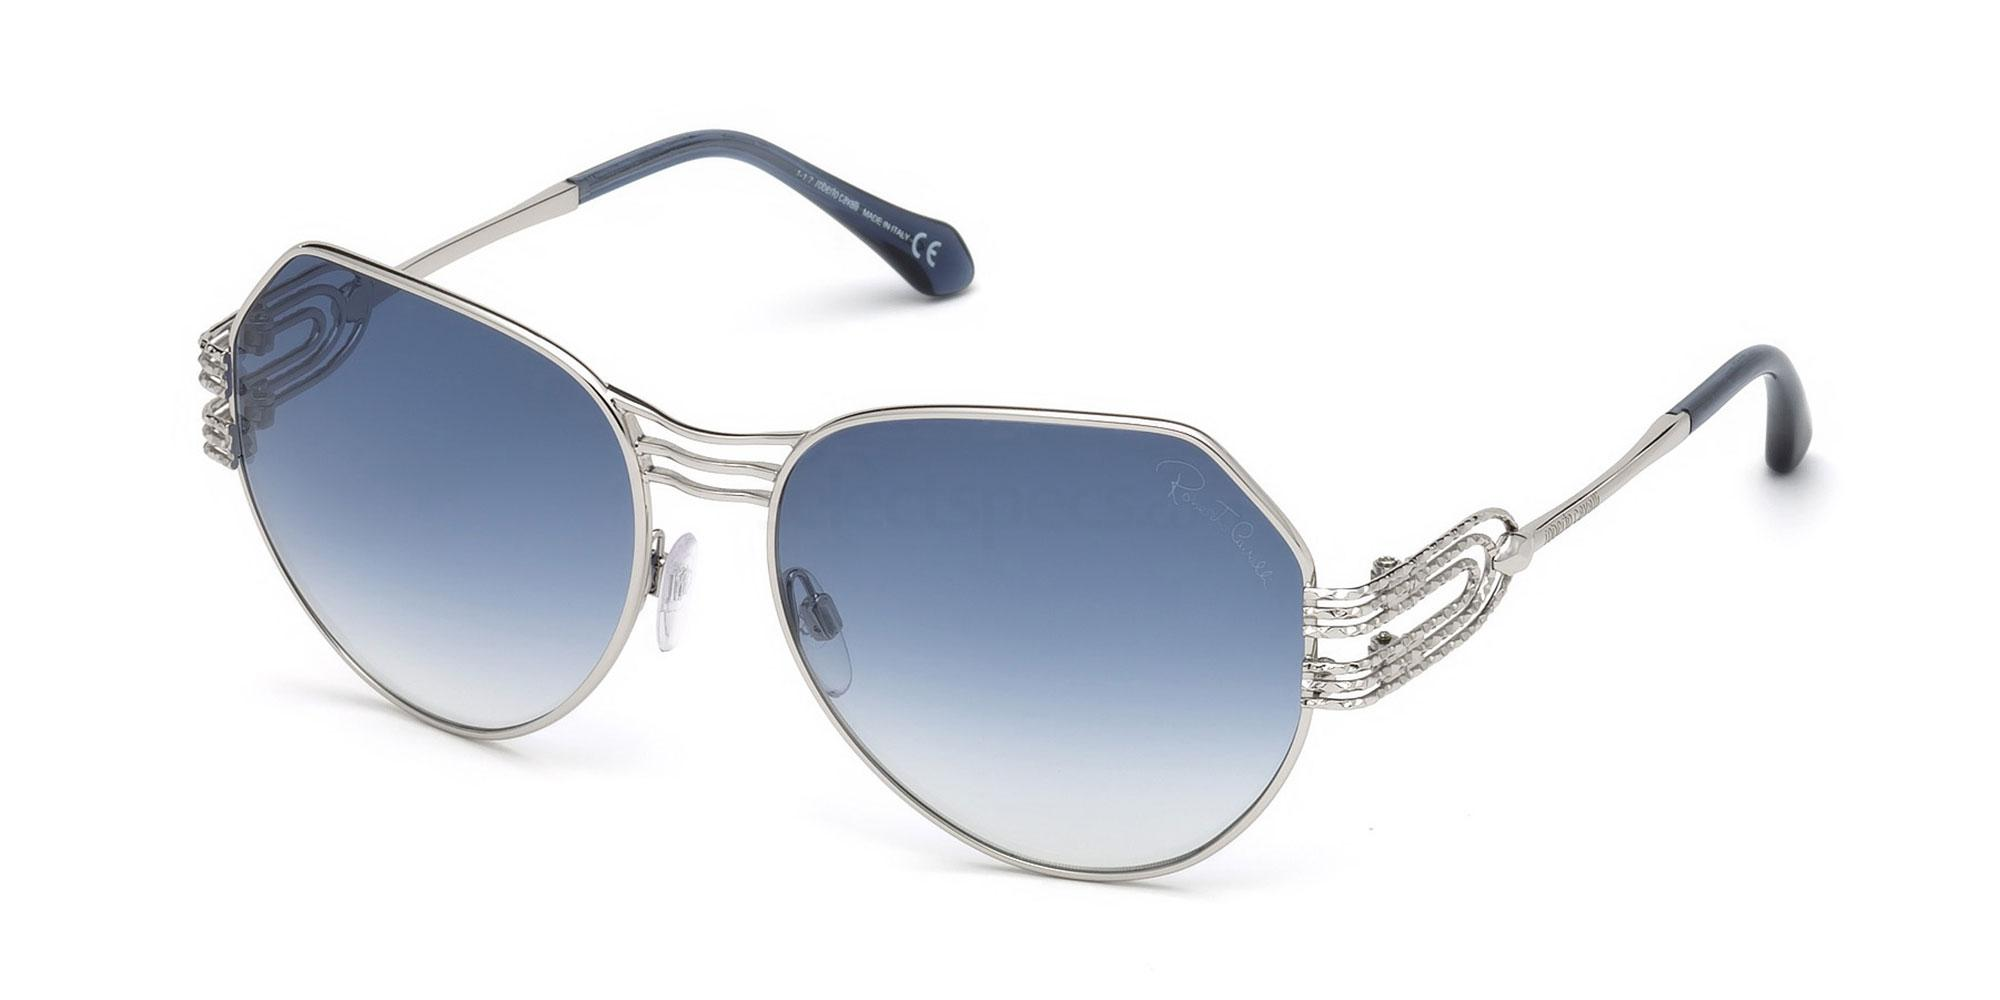 16W RC1064 Sunglasses, Roberto Cavalli